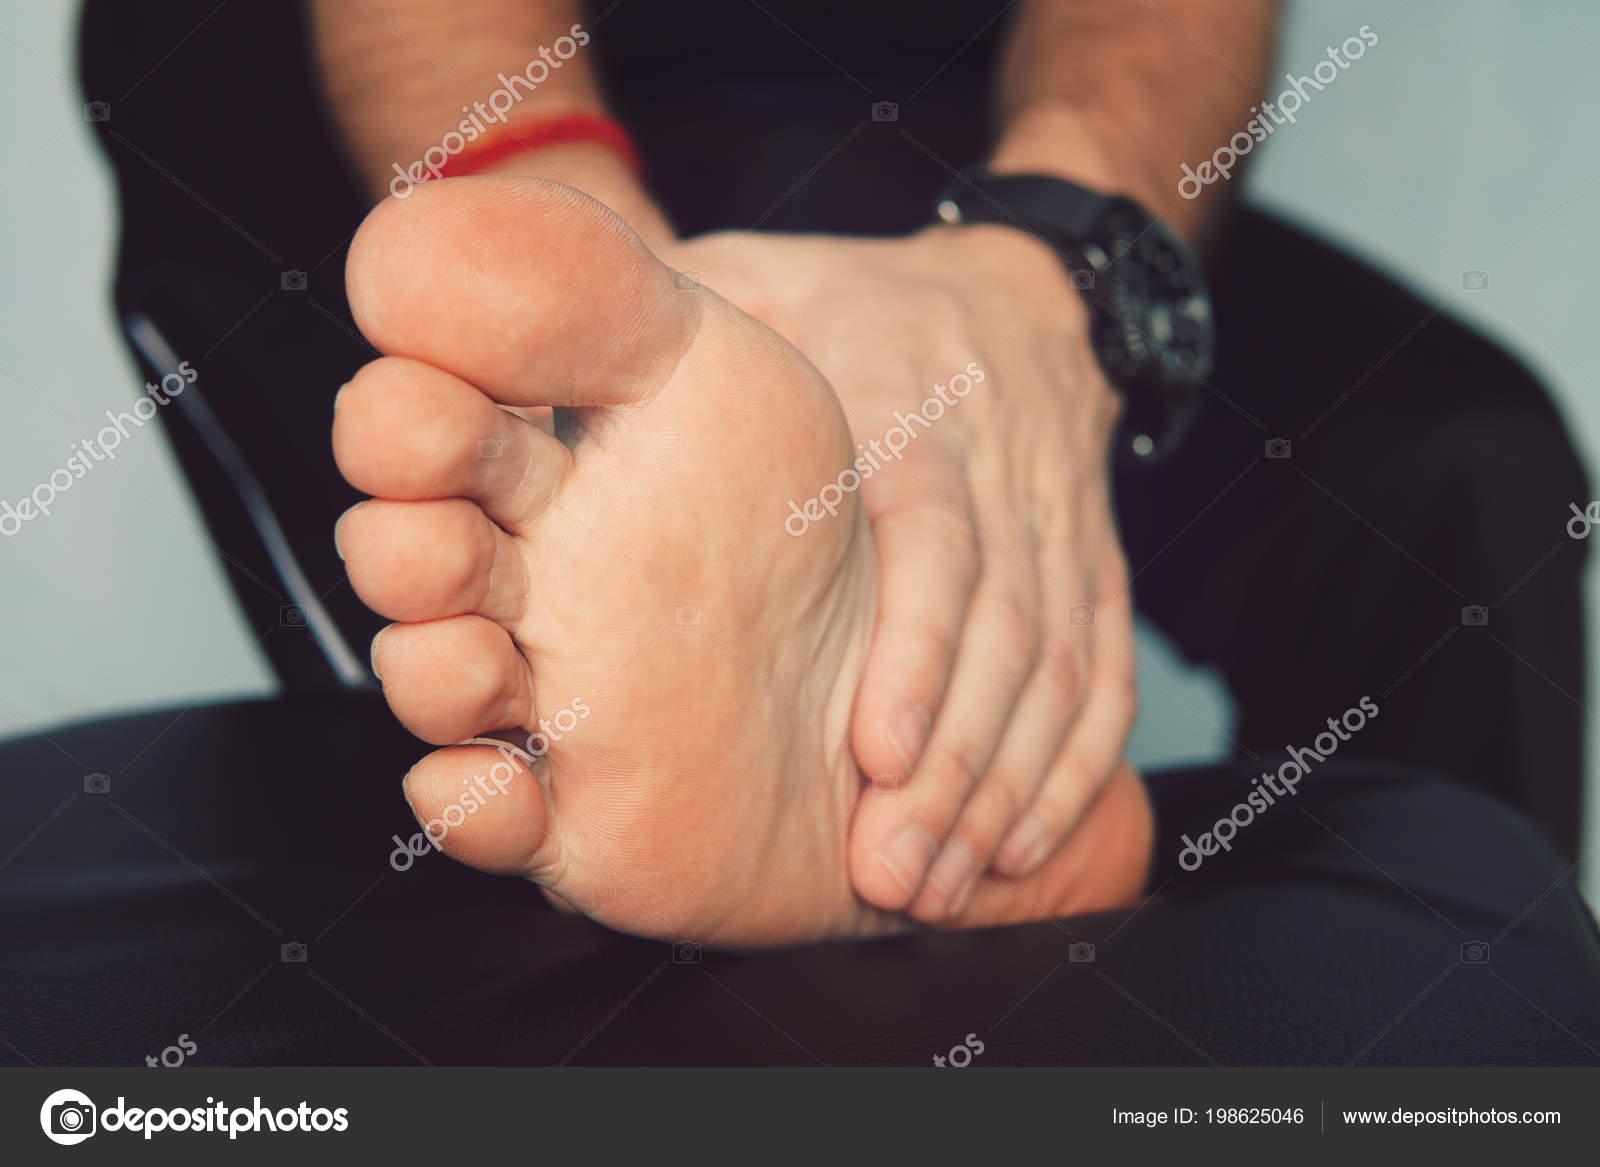 Gota en el dedo gordo de la mano